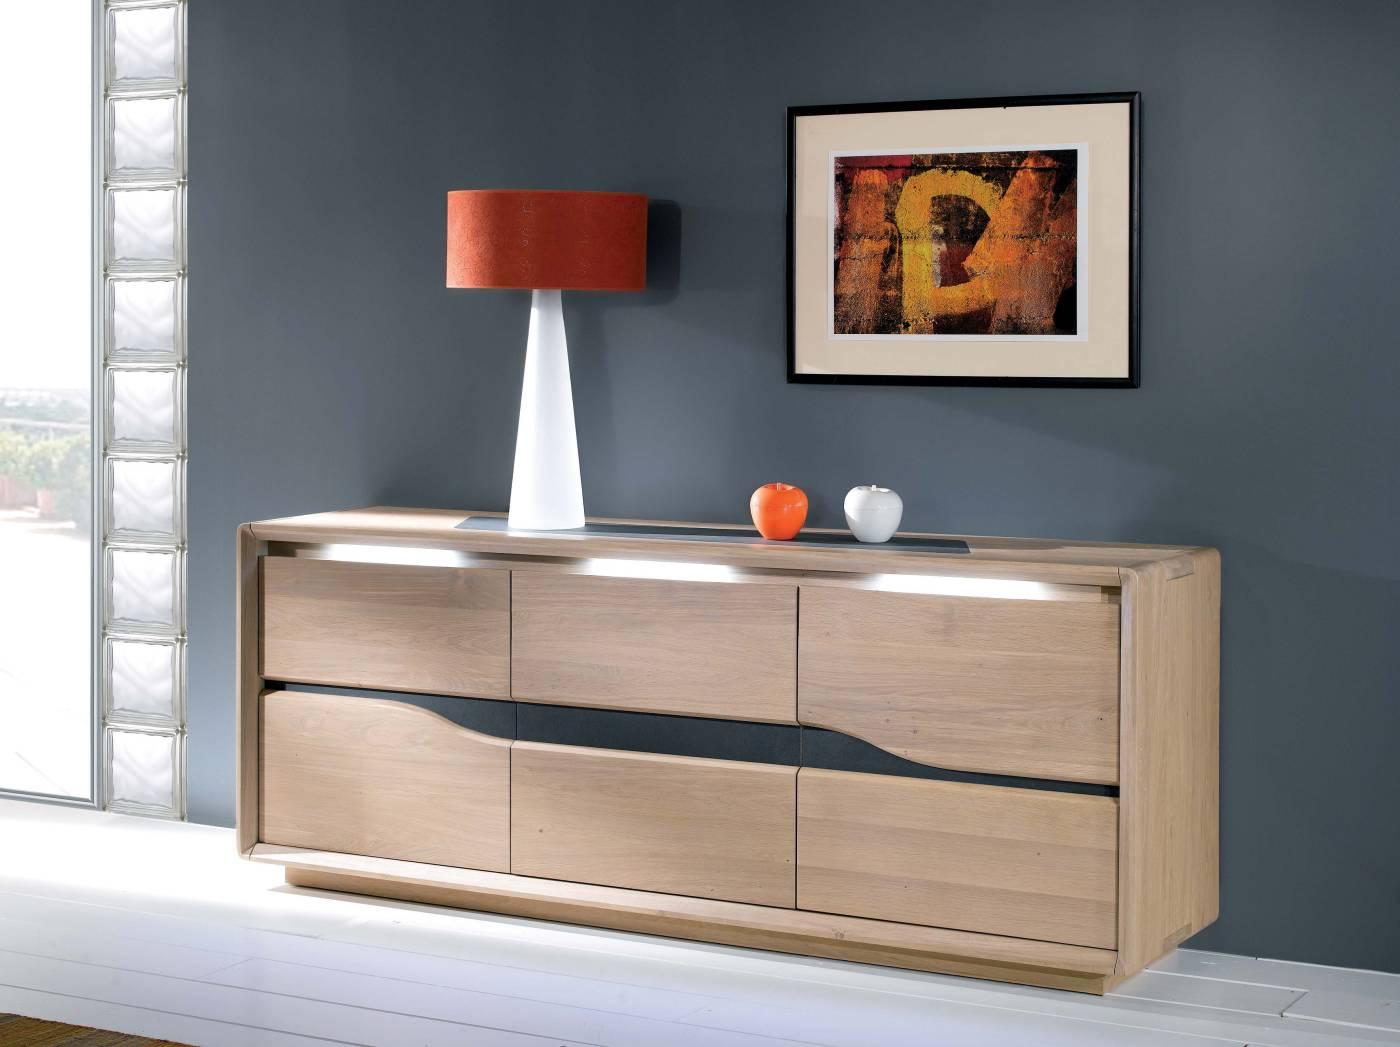 salle a manger table design ceramique ateliers langres meubles gibaud. Black Bedroom Furniture Sets. Home Design Ideas